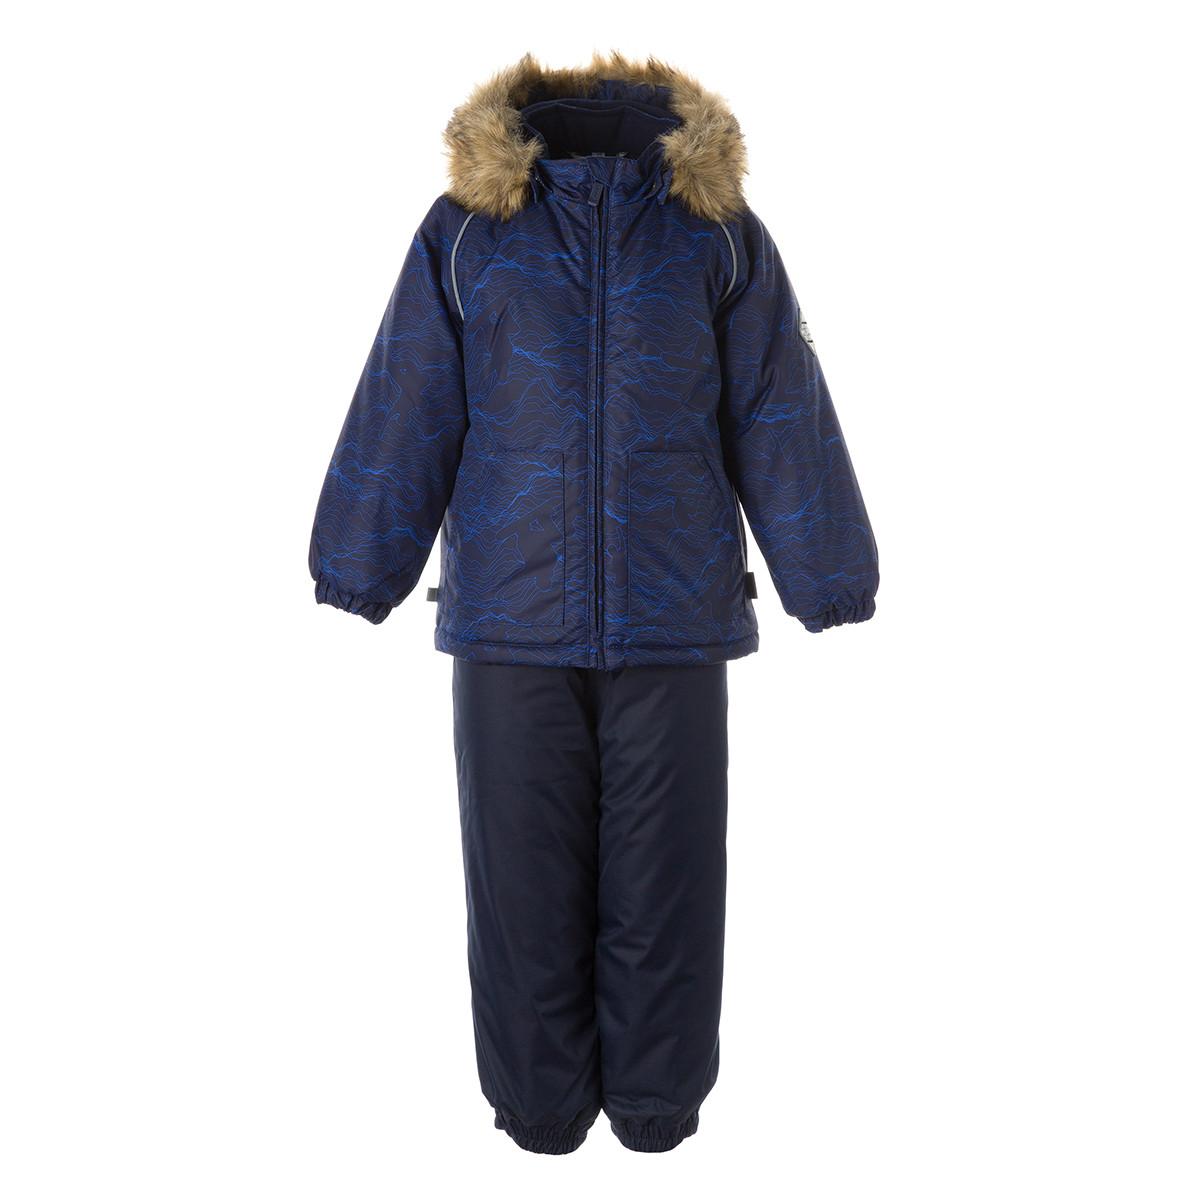 Детский комплект Huppa AVERY, тёмно-синий с принтом